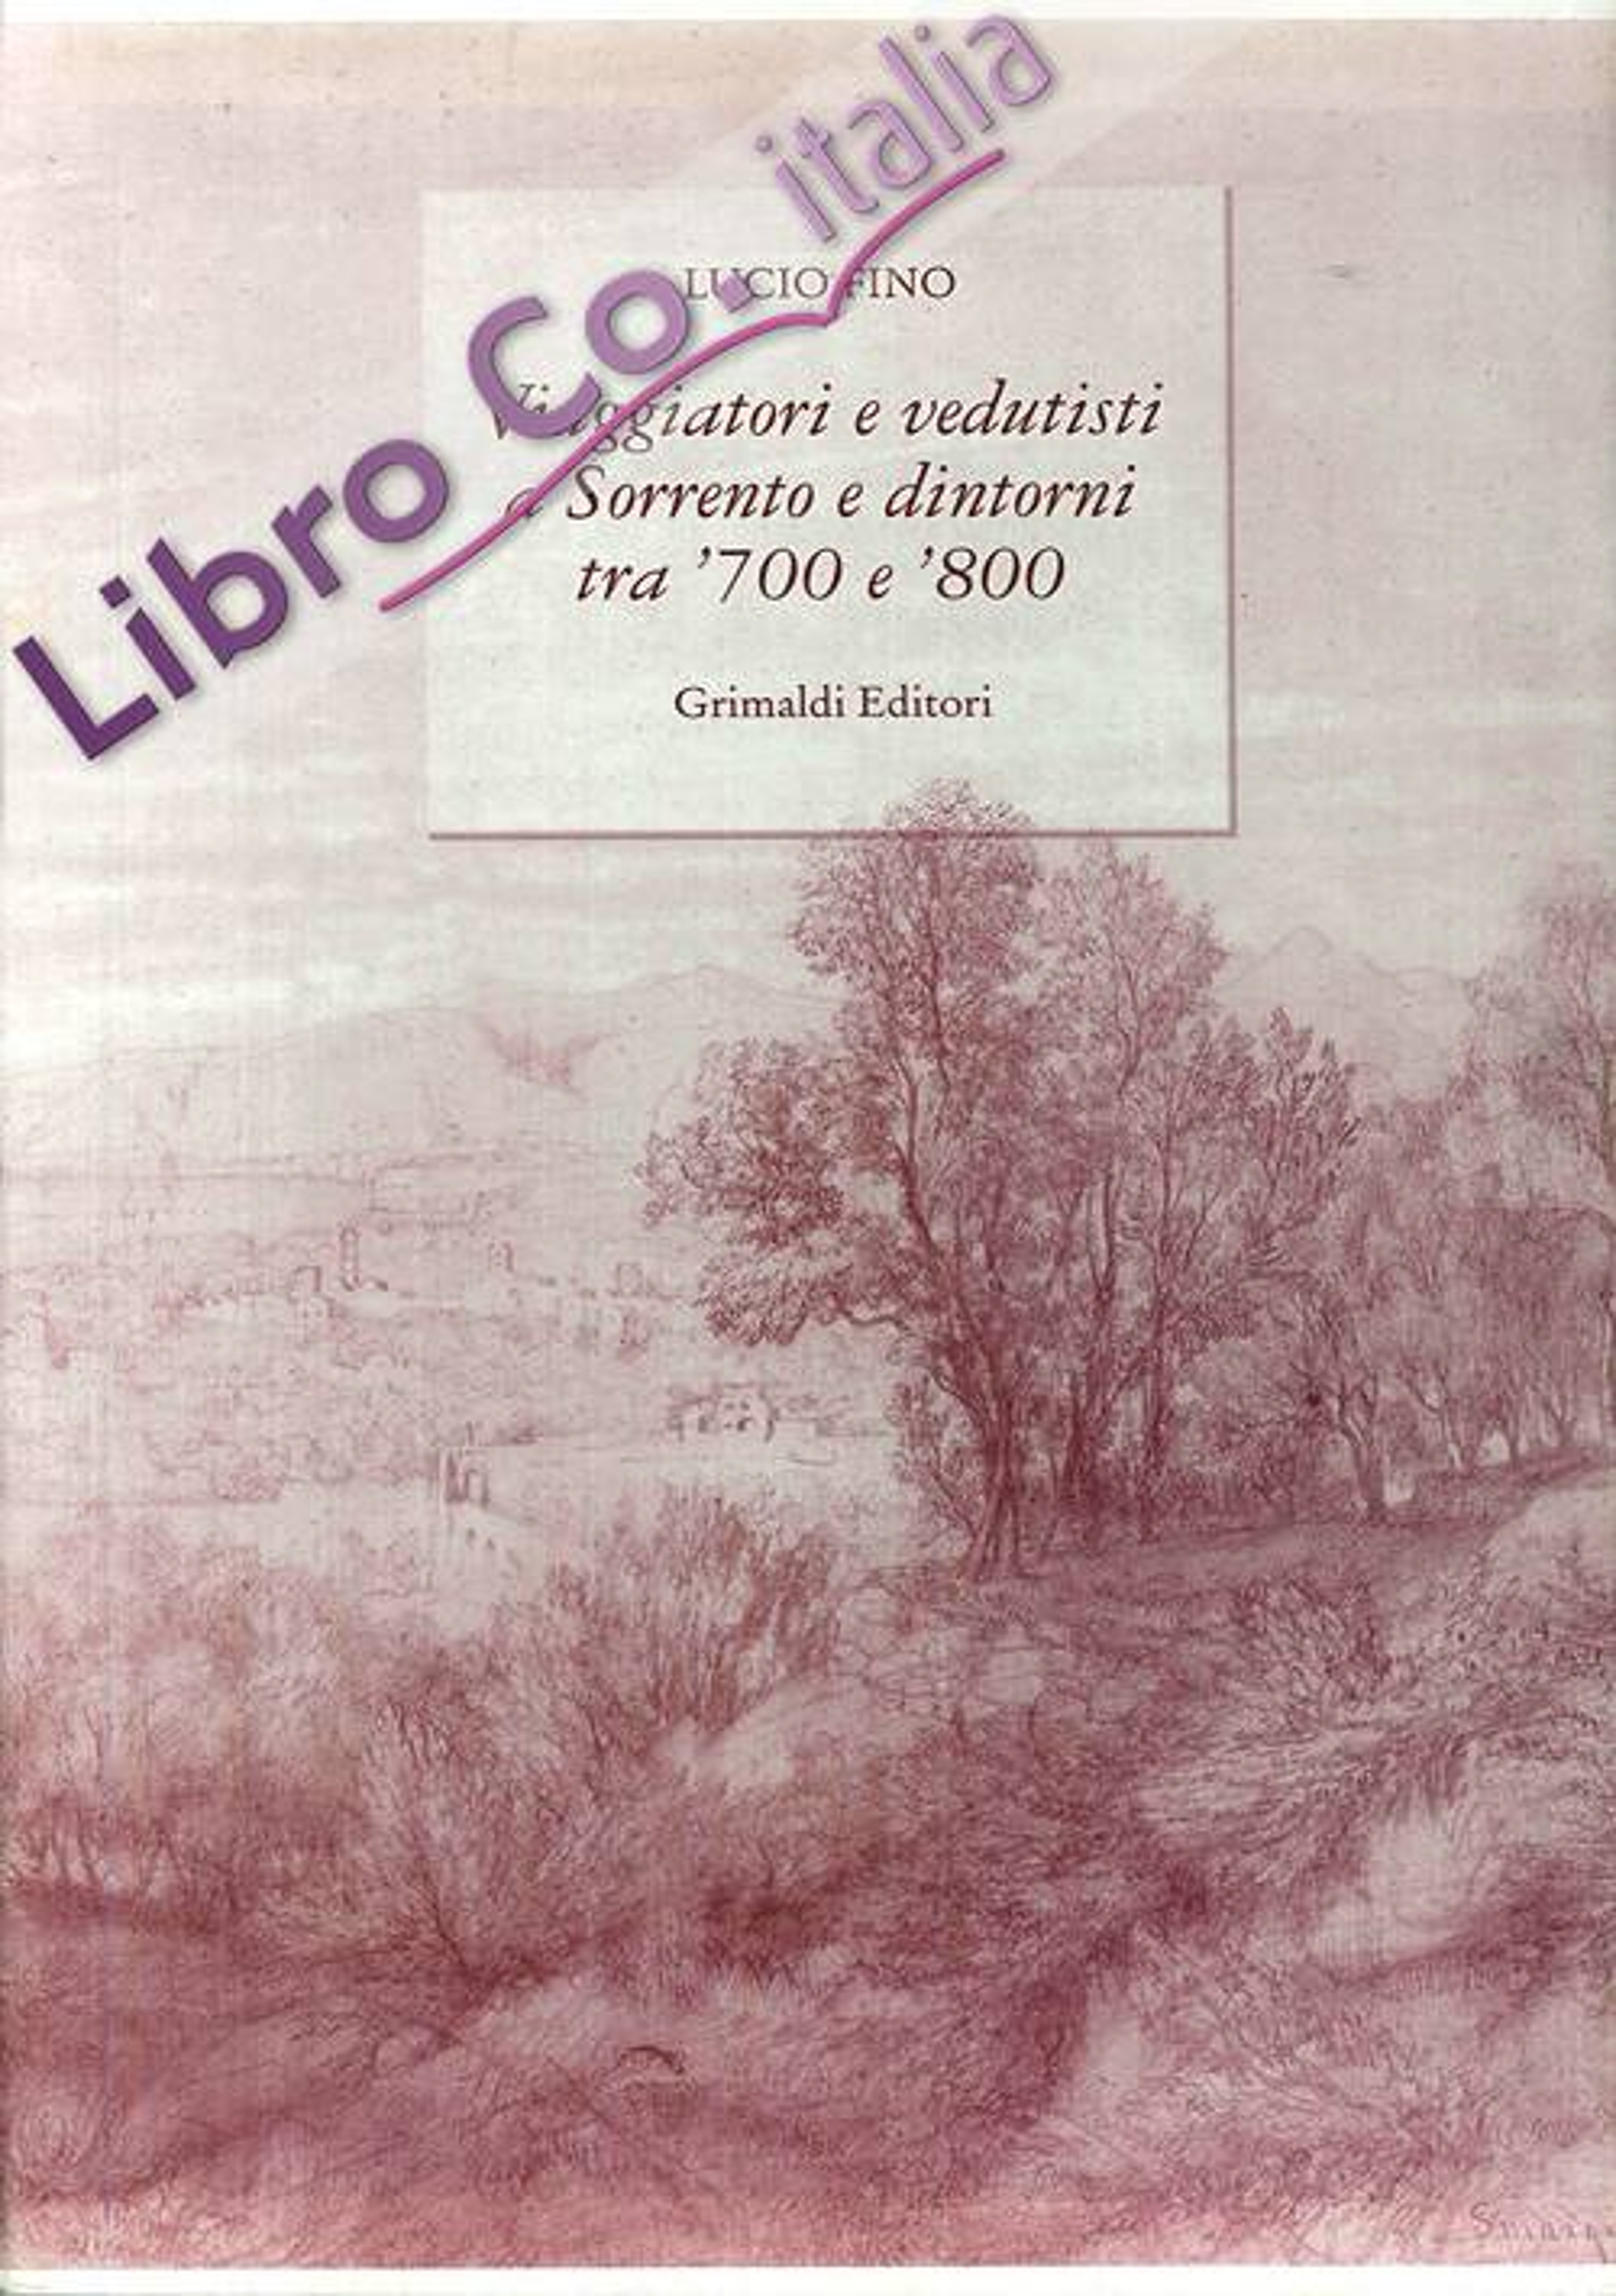 Viaggiatori e vedutisti a Sorrento e dintorni tra '700 e '800.